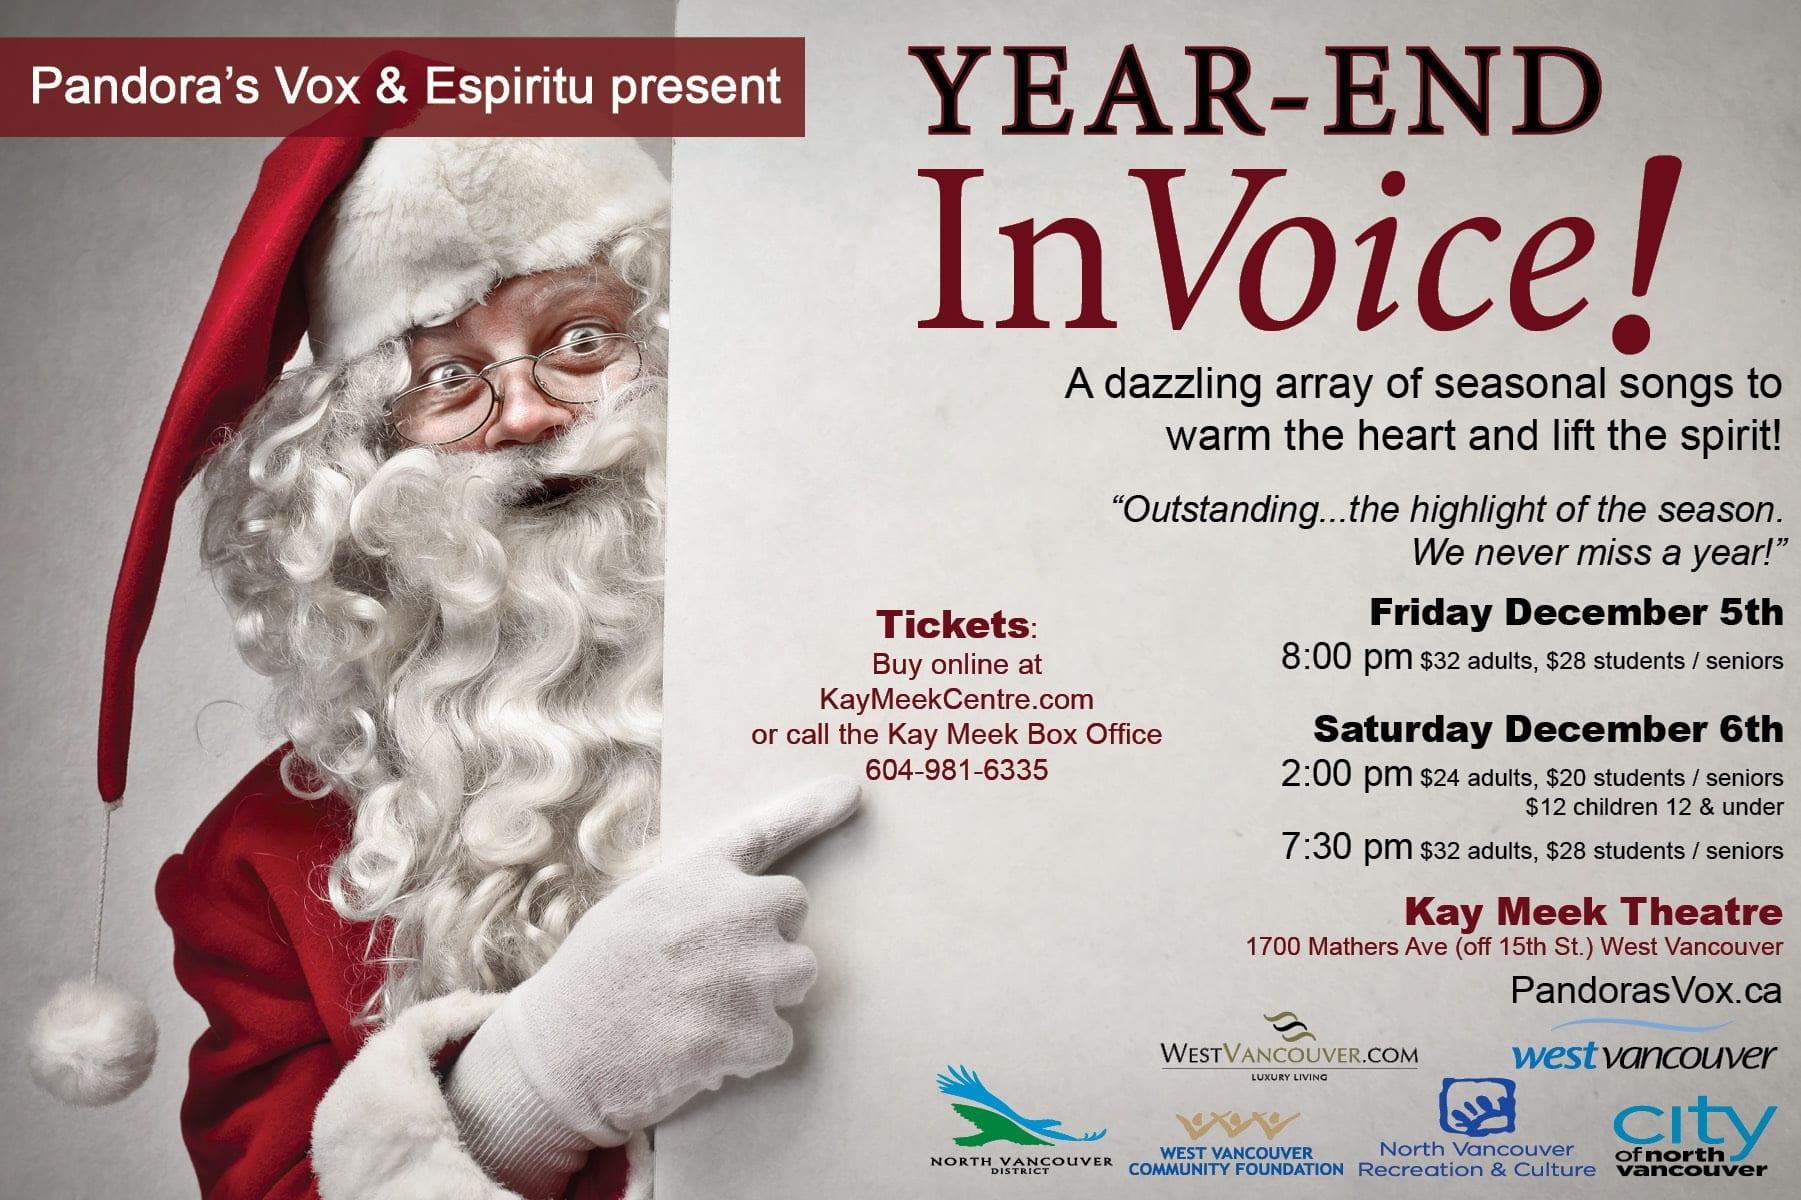 Pandora's Vox & Espiritu presents Year-End InVoice! at the Kay Meek Centre